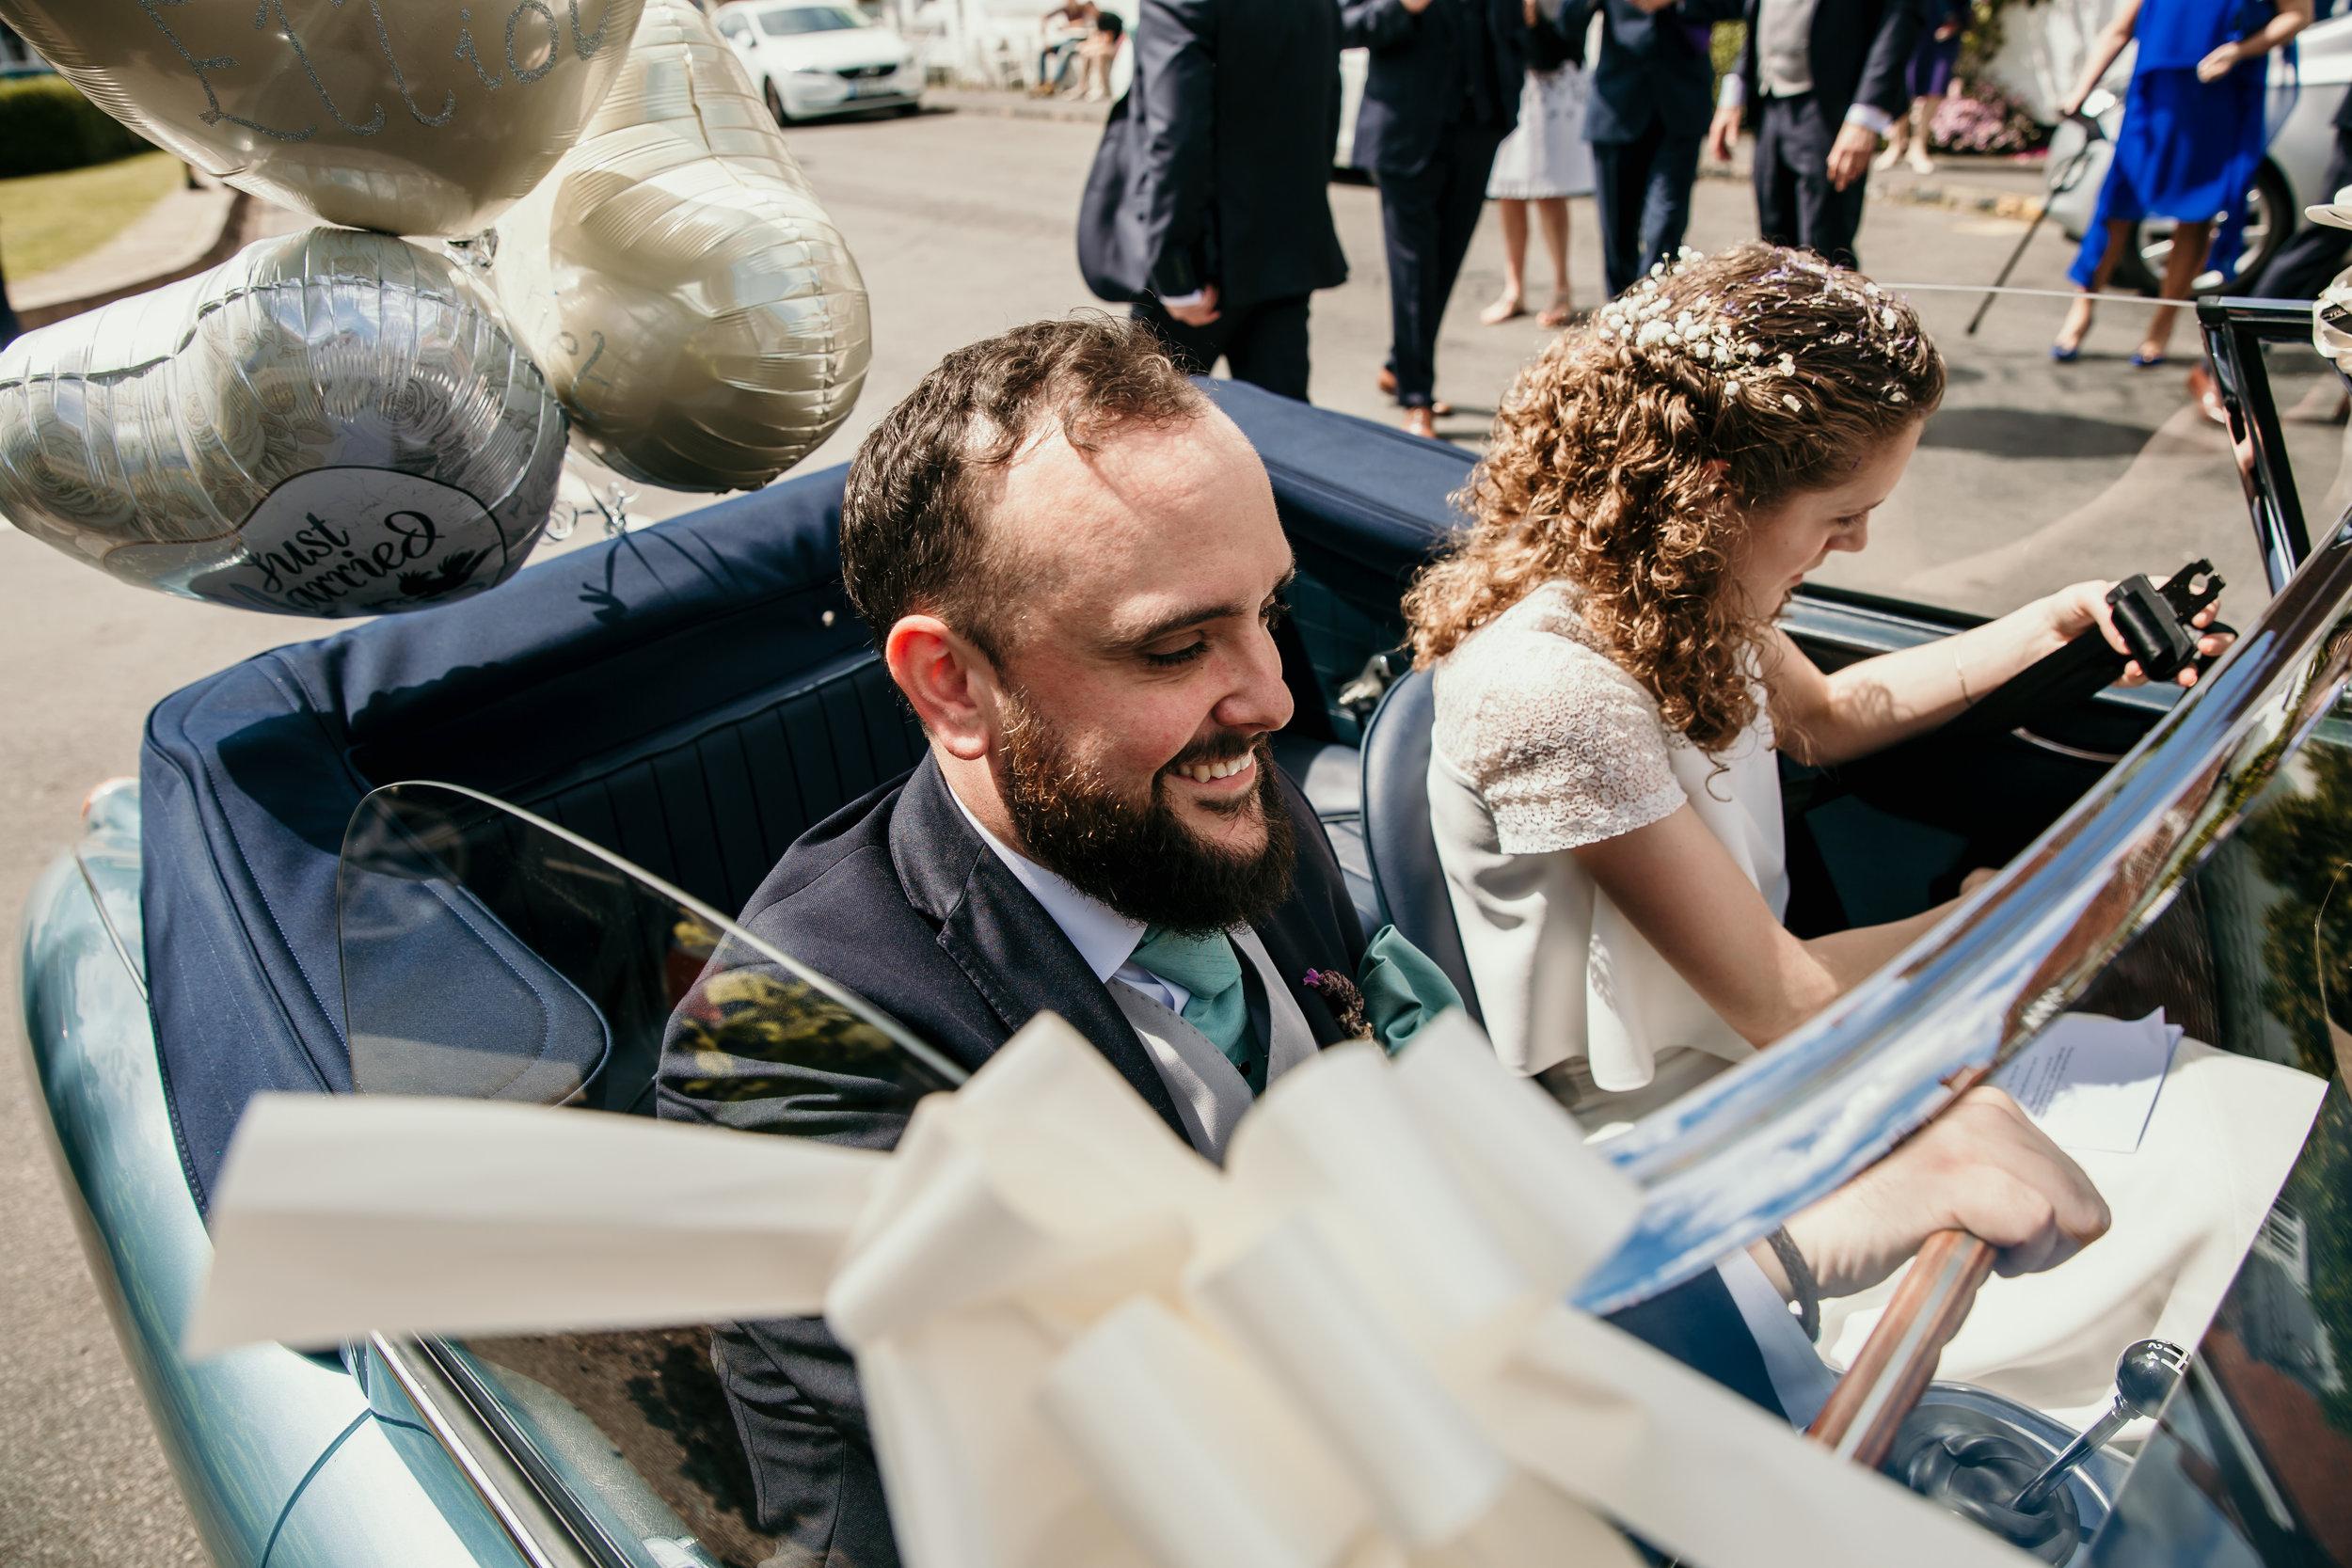 THOMAS WEDDING-135342.jpg